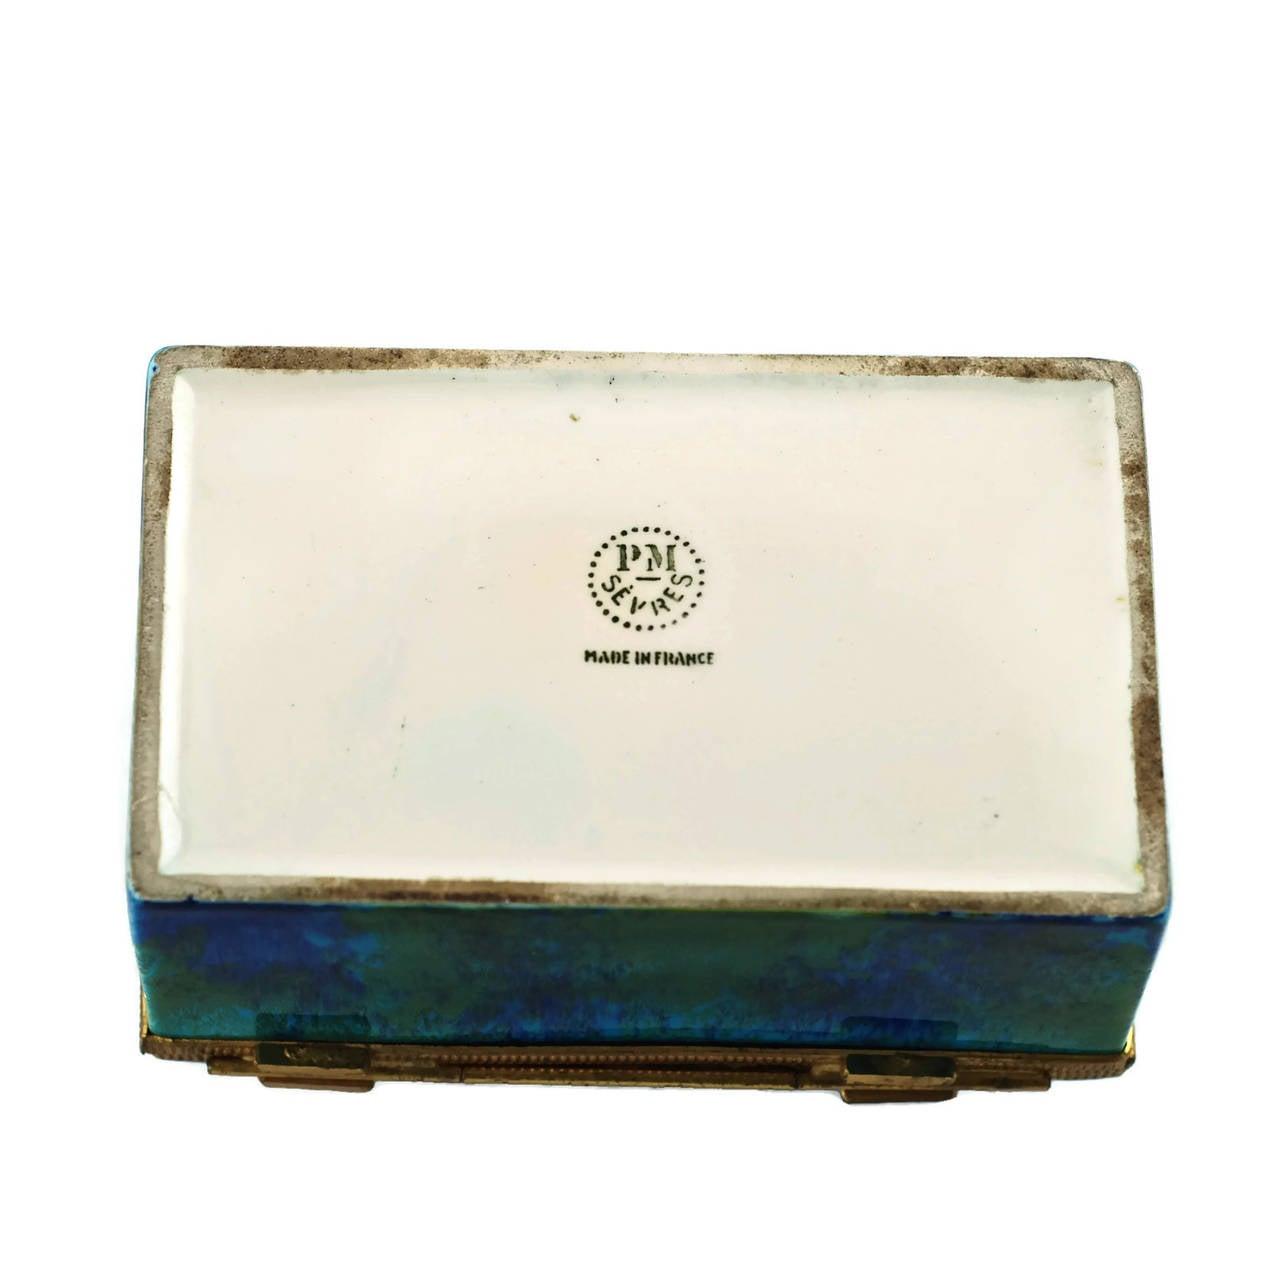 Paul Milet Sèvres Porcelain Hinged Dresser Box with Ormolu Mounts For Sale 3